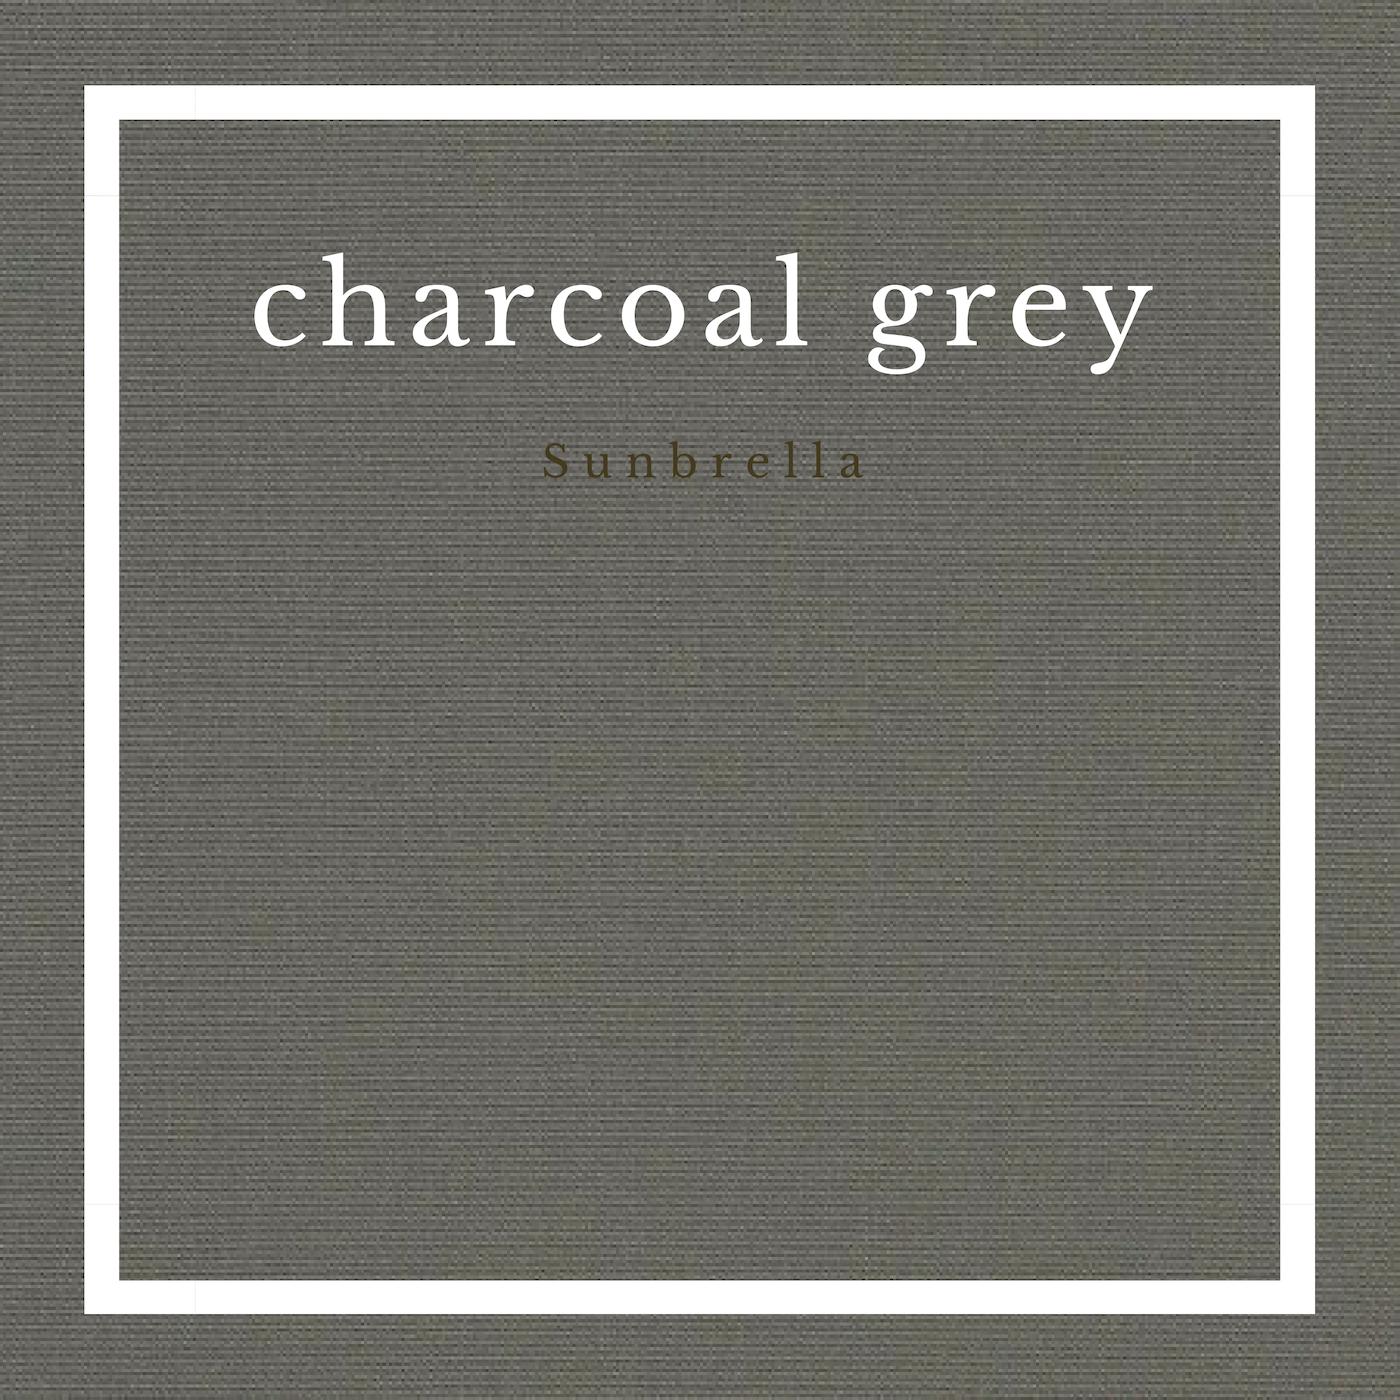 charcoal-grey-sunbrella.jpg